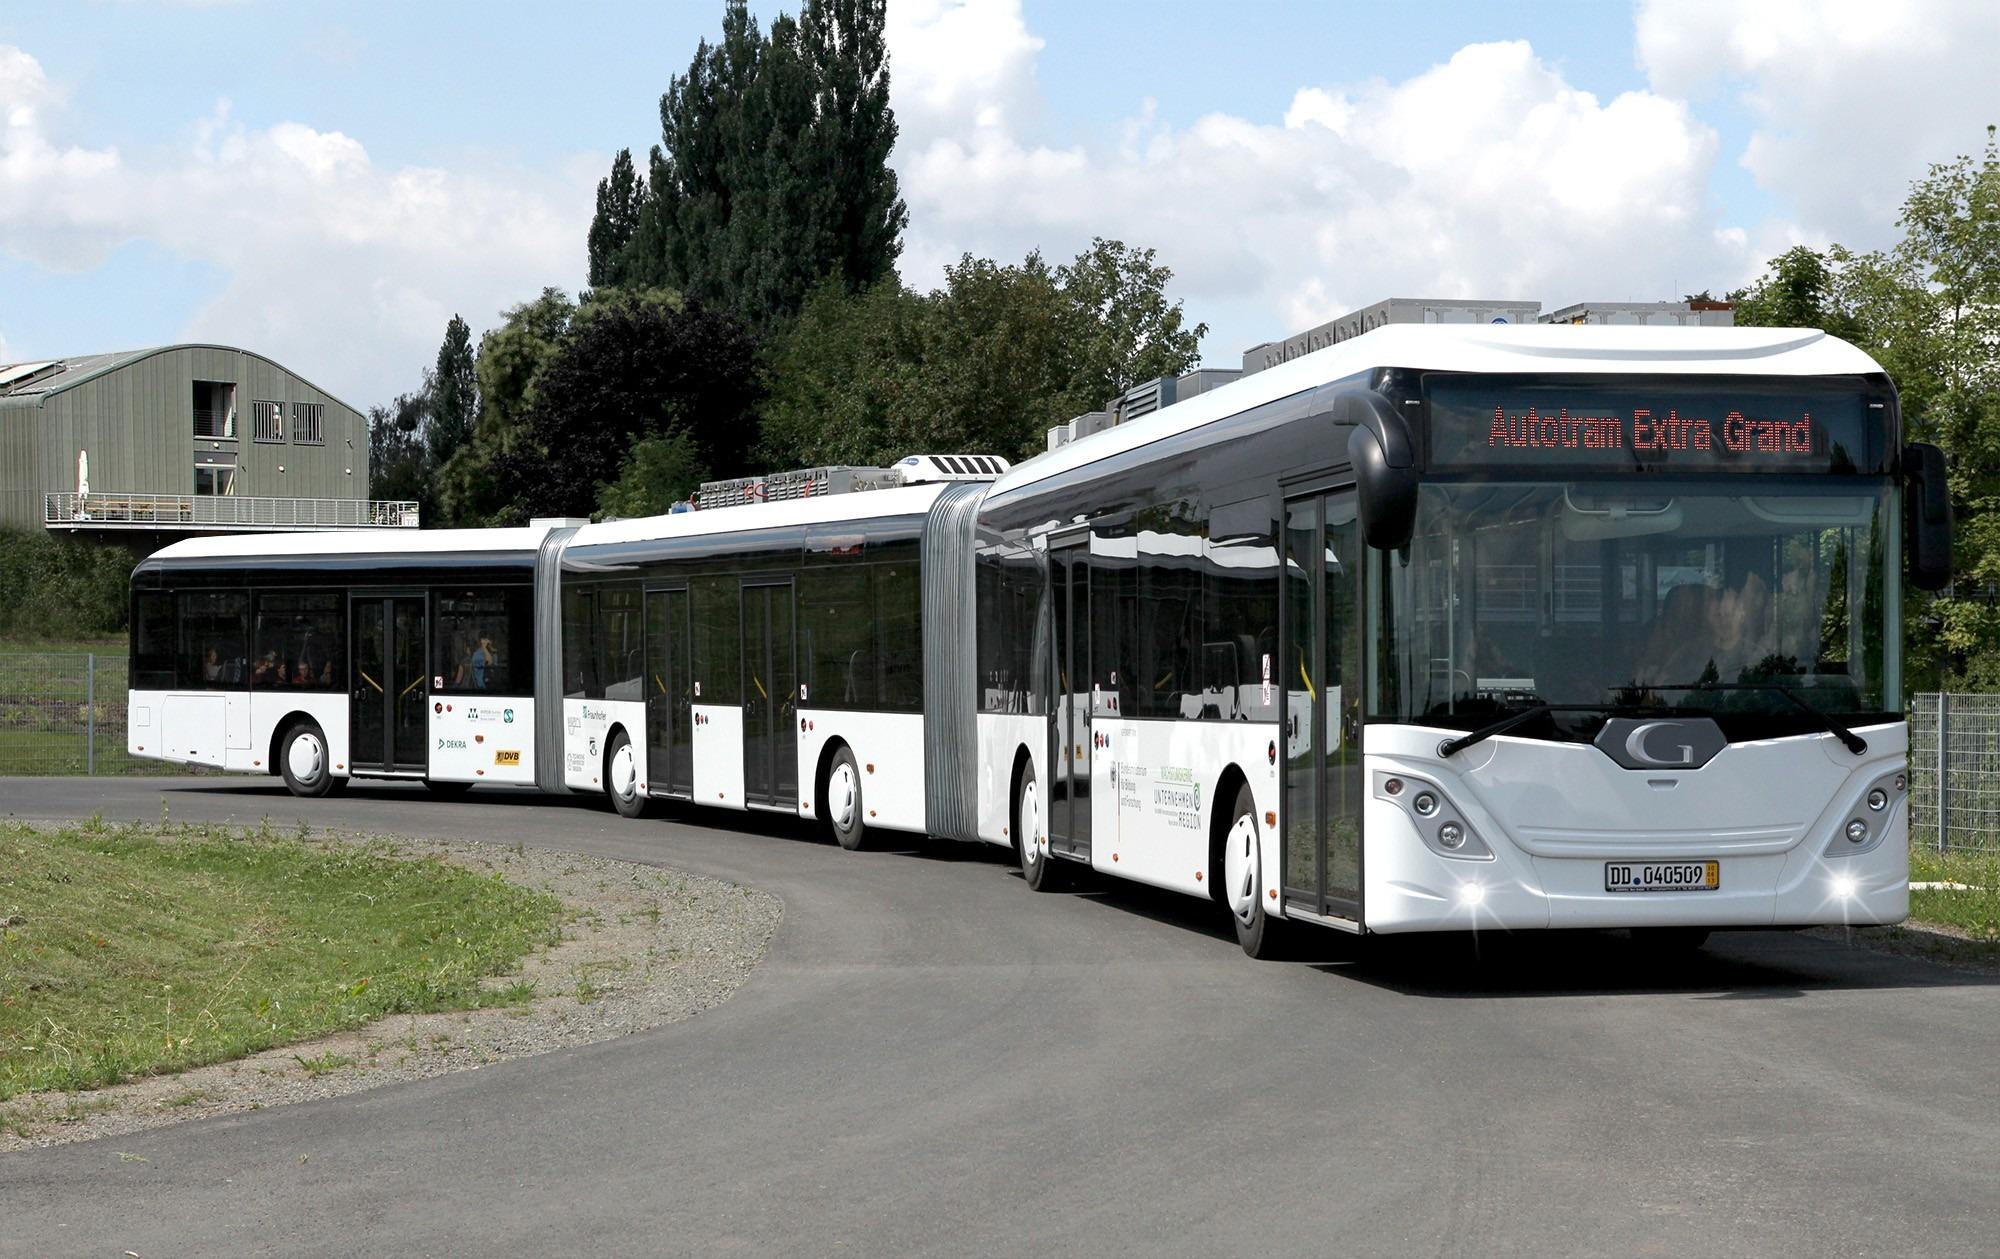 Autotram Extra-Grand